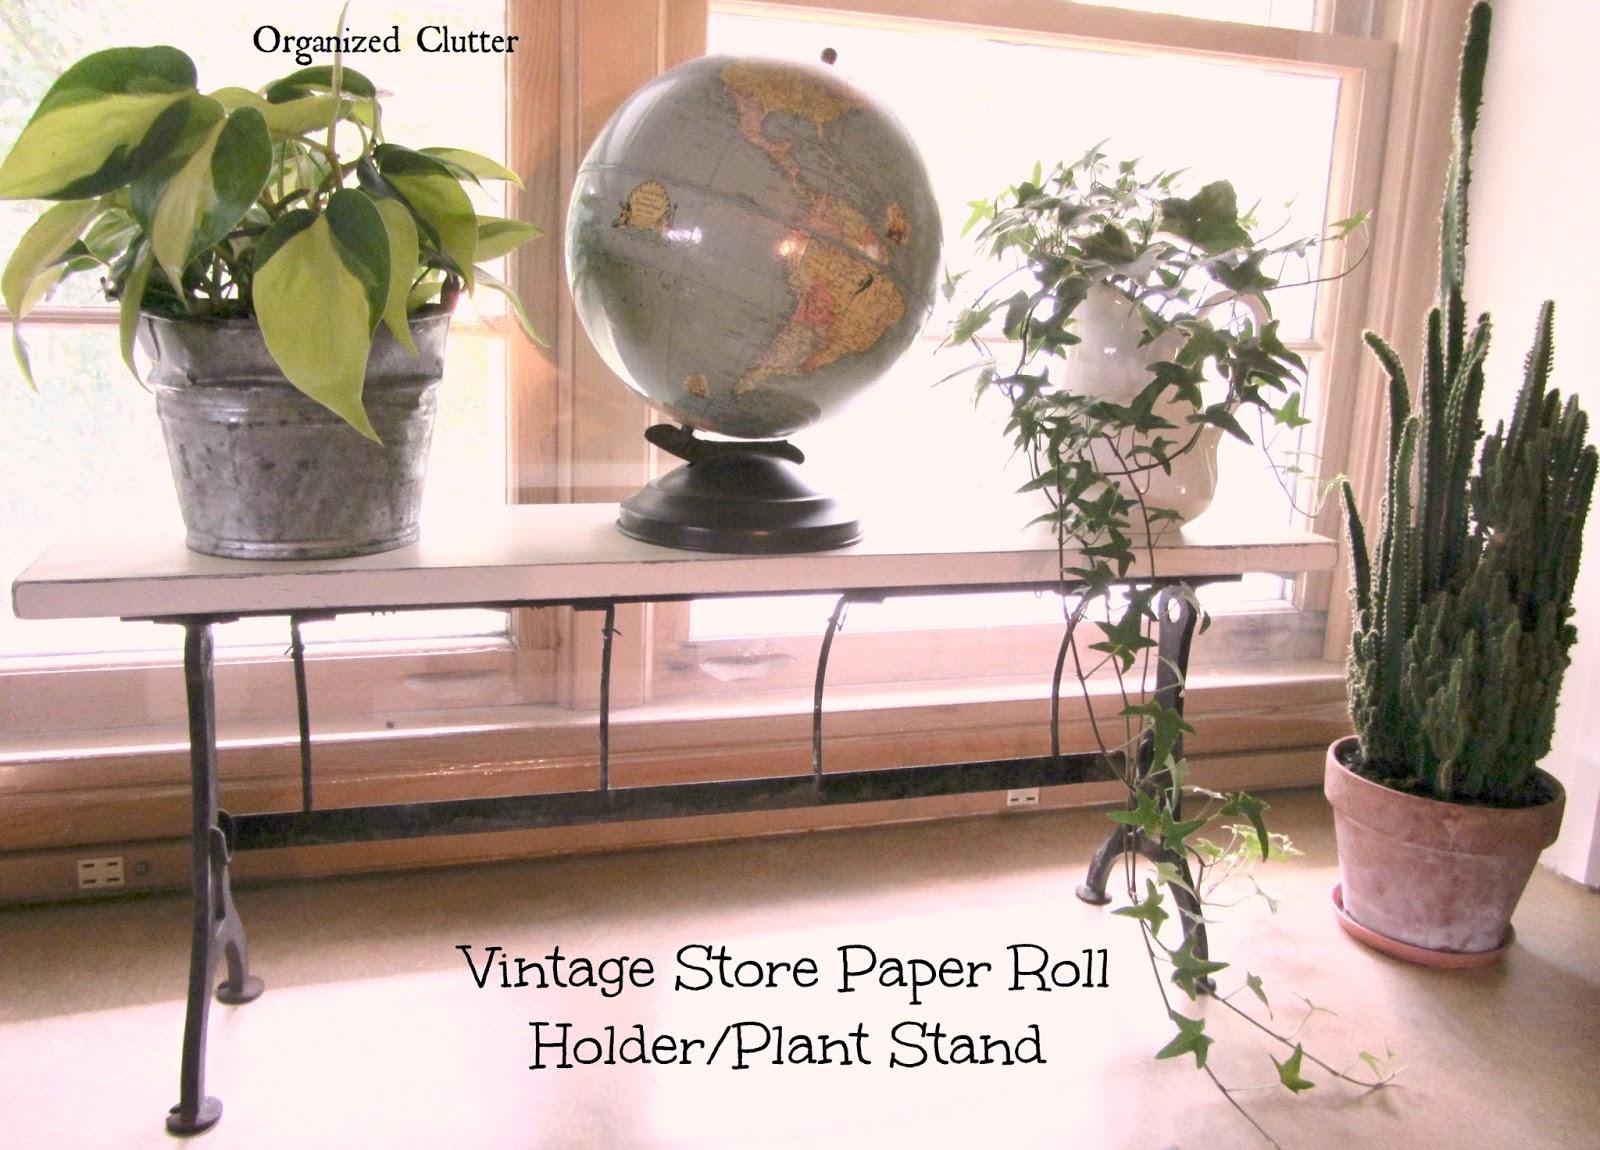 Rustic Plant Stand or Shelf www.organizedclutterqueen.blogspot.com